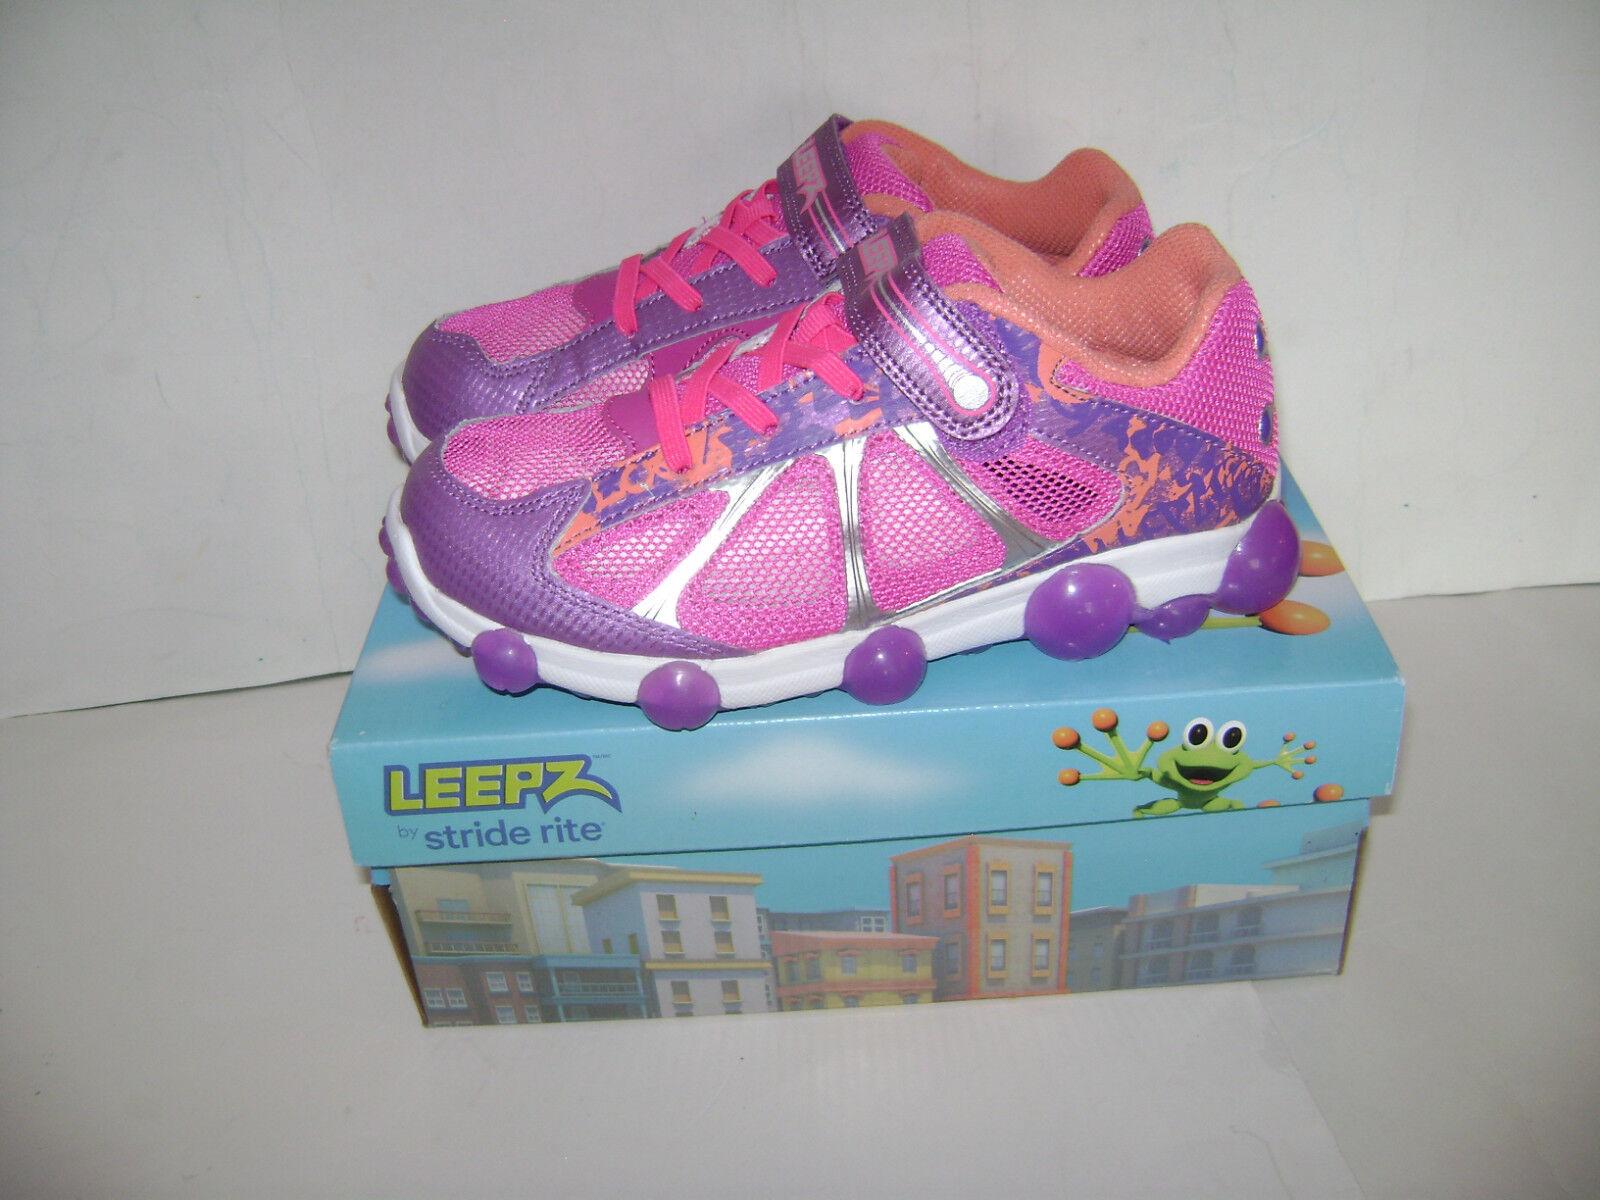 Stride Rite Leepz Light up Sneaker Kids Girls Shoes Size 2 5 M